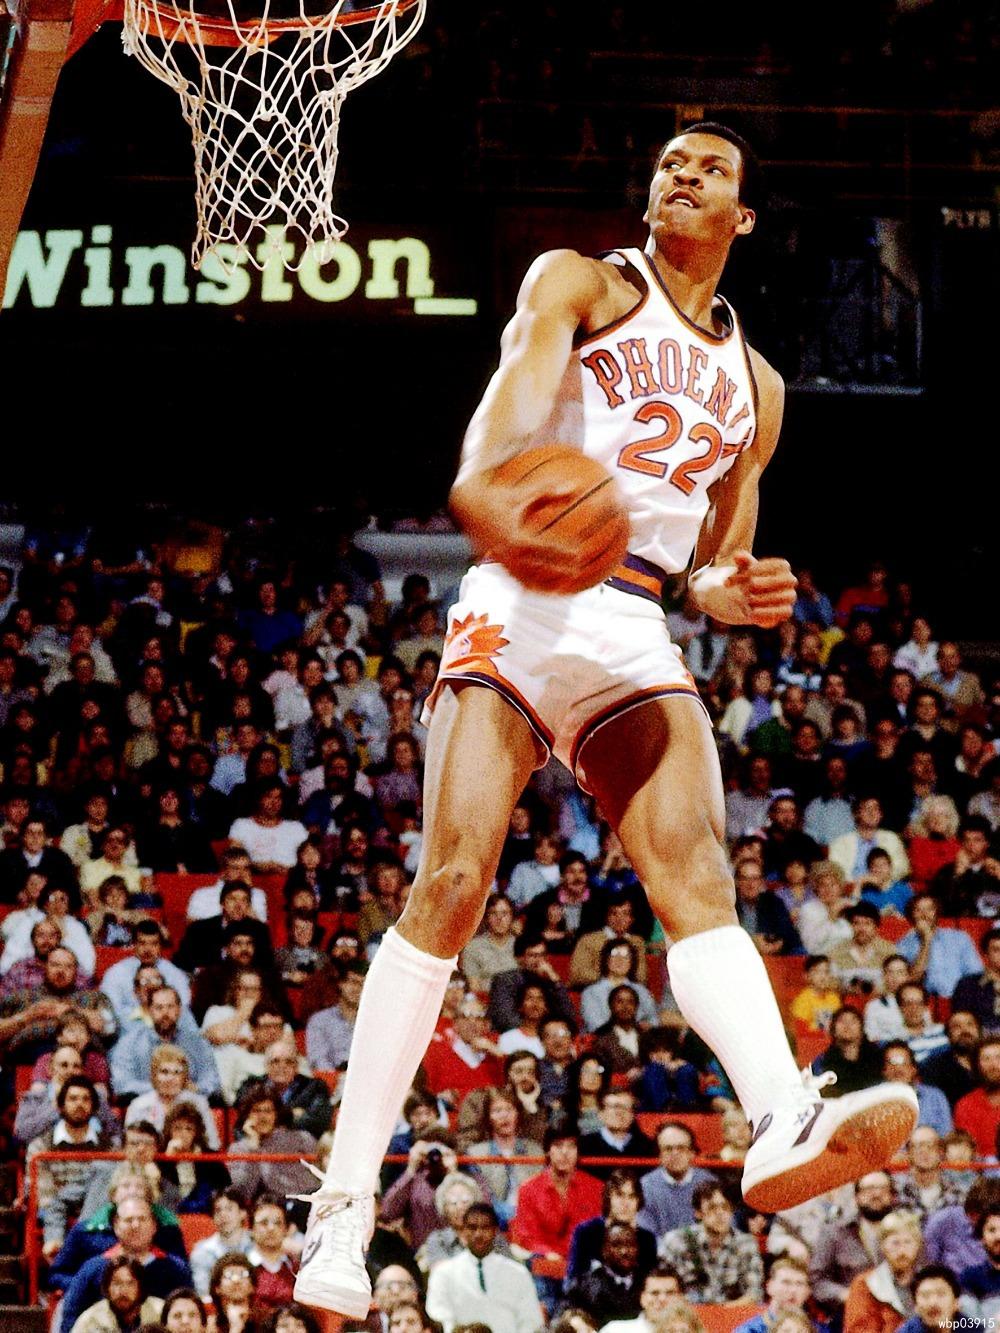 Larry-Nance-Slam-Dunk-Phoenix-Suns-Basketball-Printing-wall-poster-wbp03915.jpg